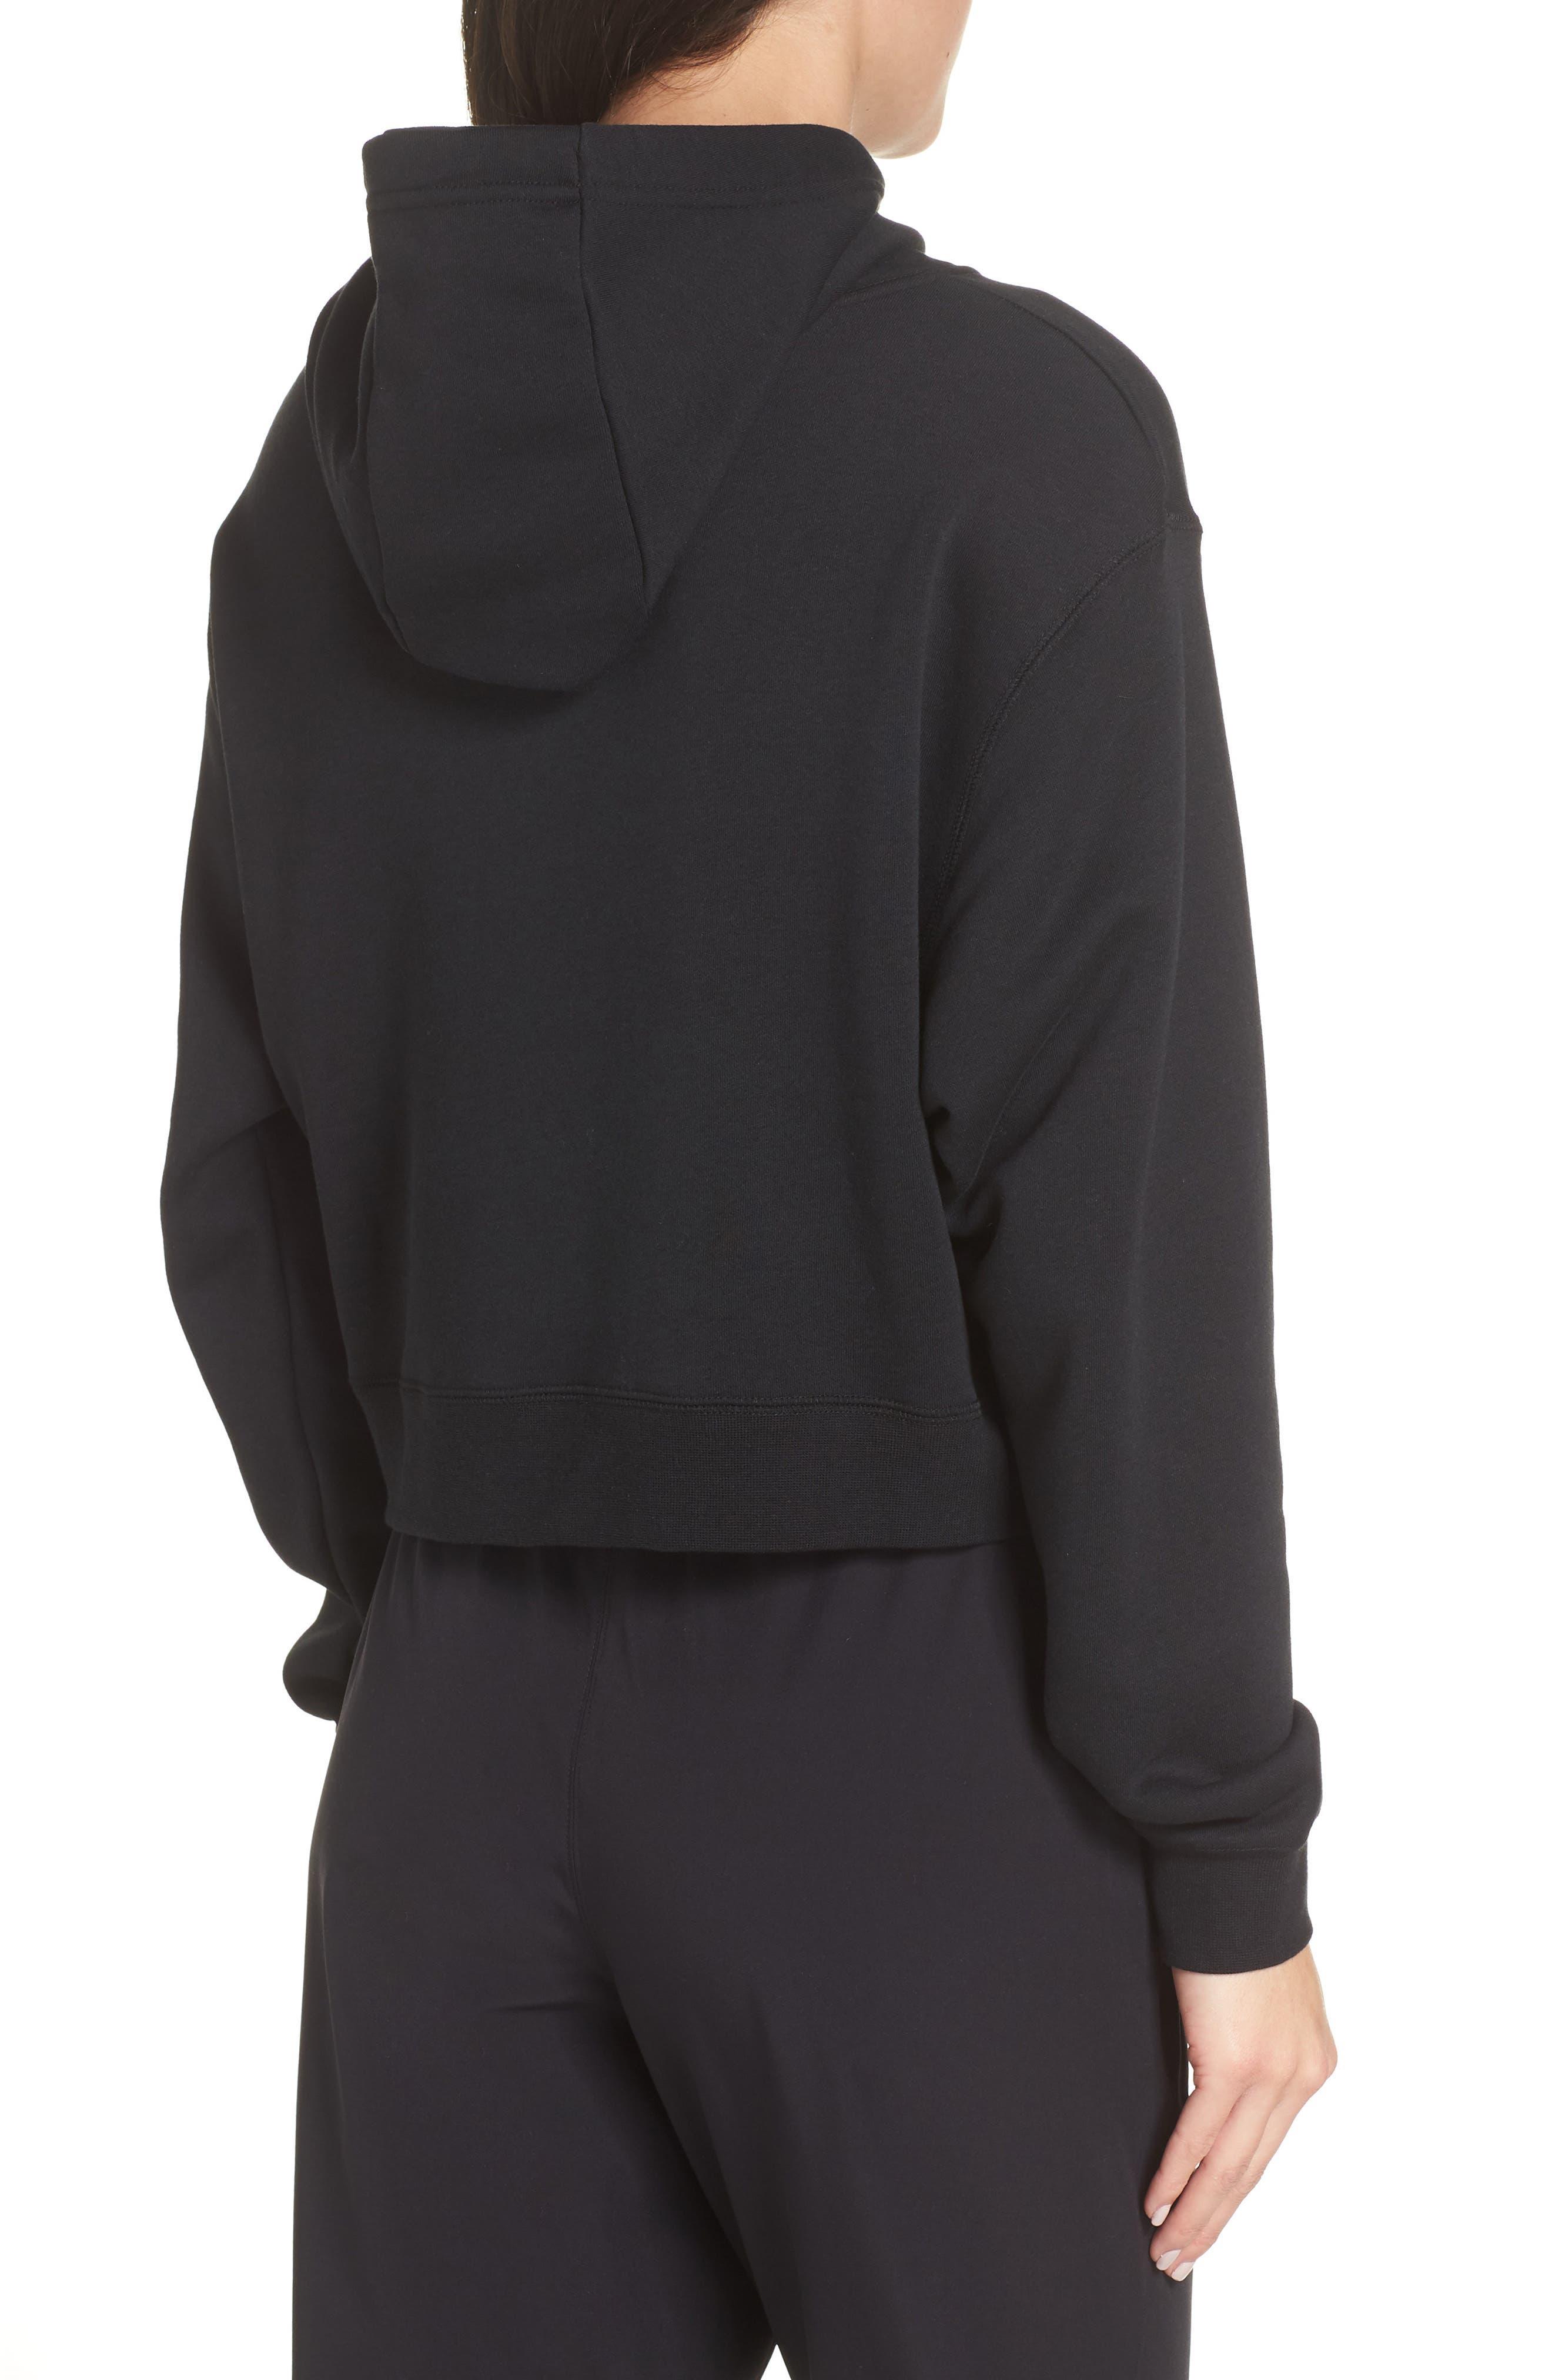 Sportswear Women's Half Zip Fleece Hoodie,                             Alternate thumbnail 2, color,                             BLACK/ BLACK/ ROSE GOLD